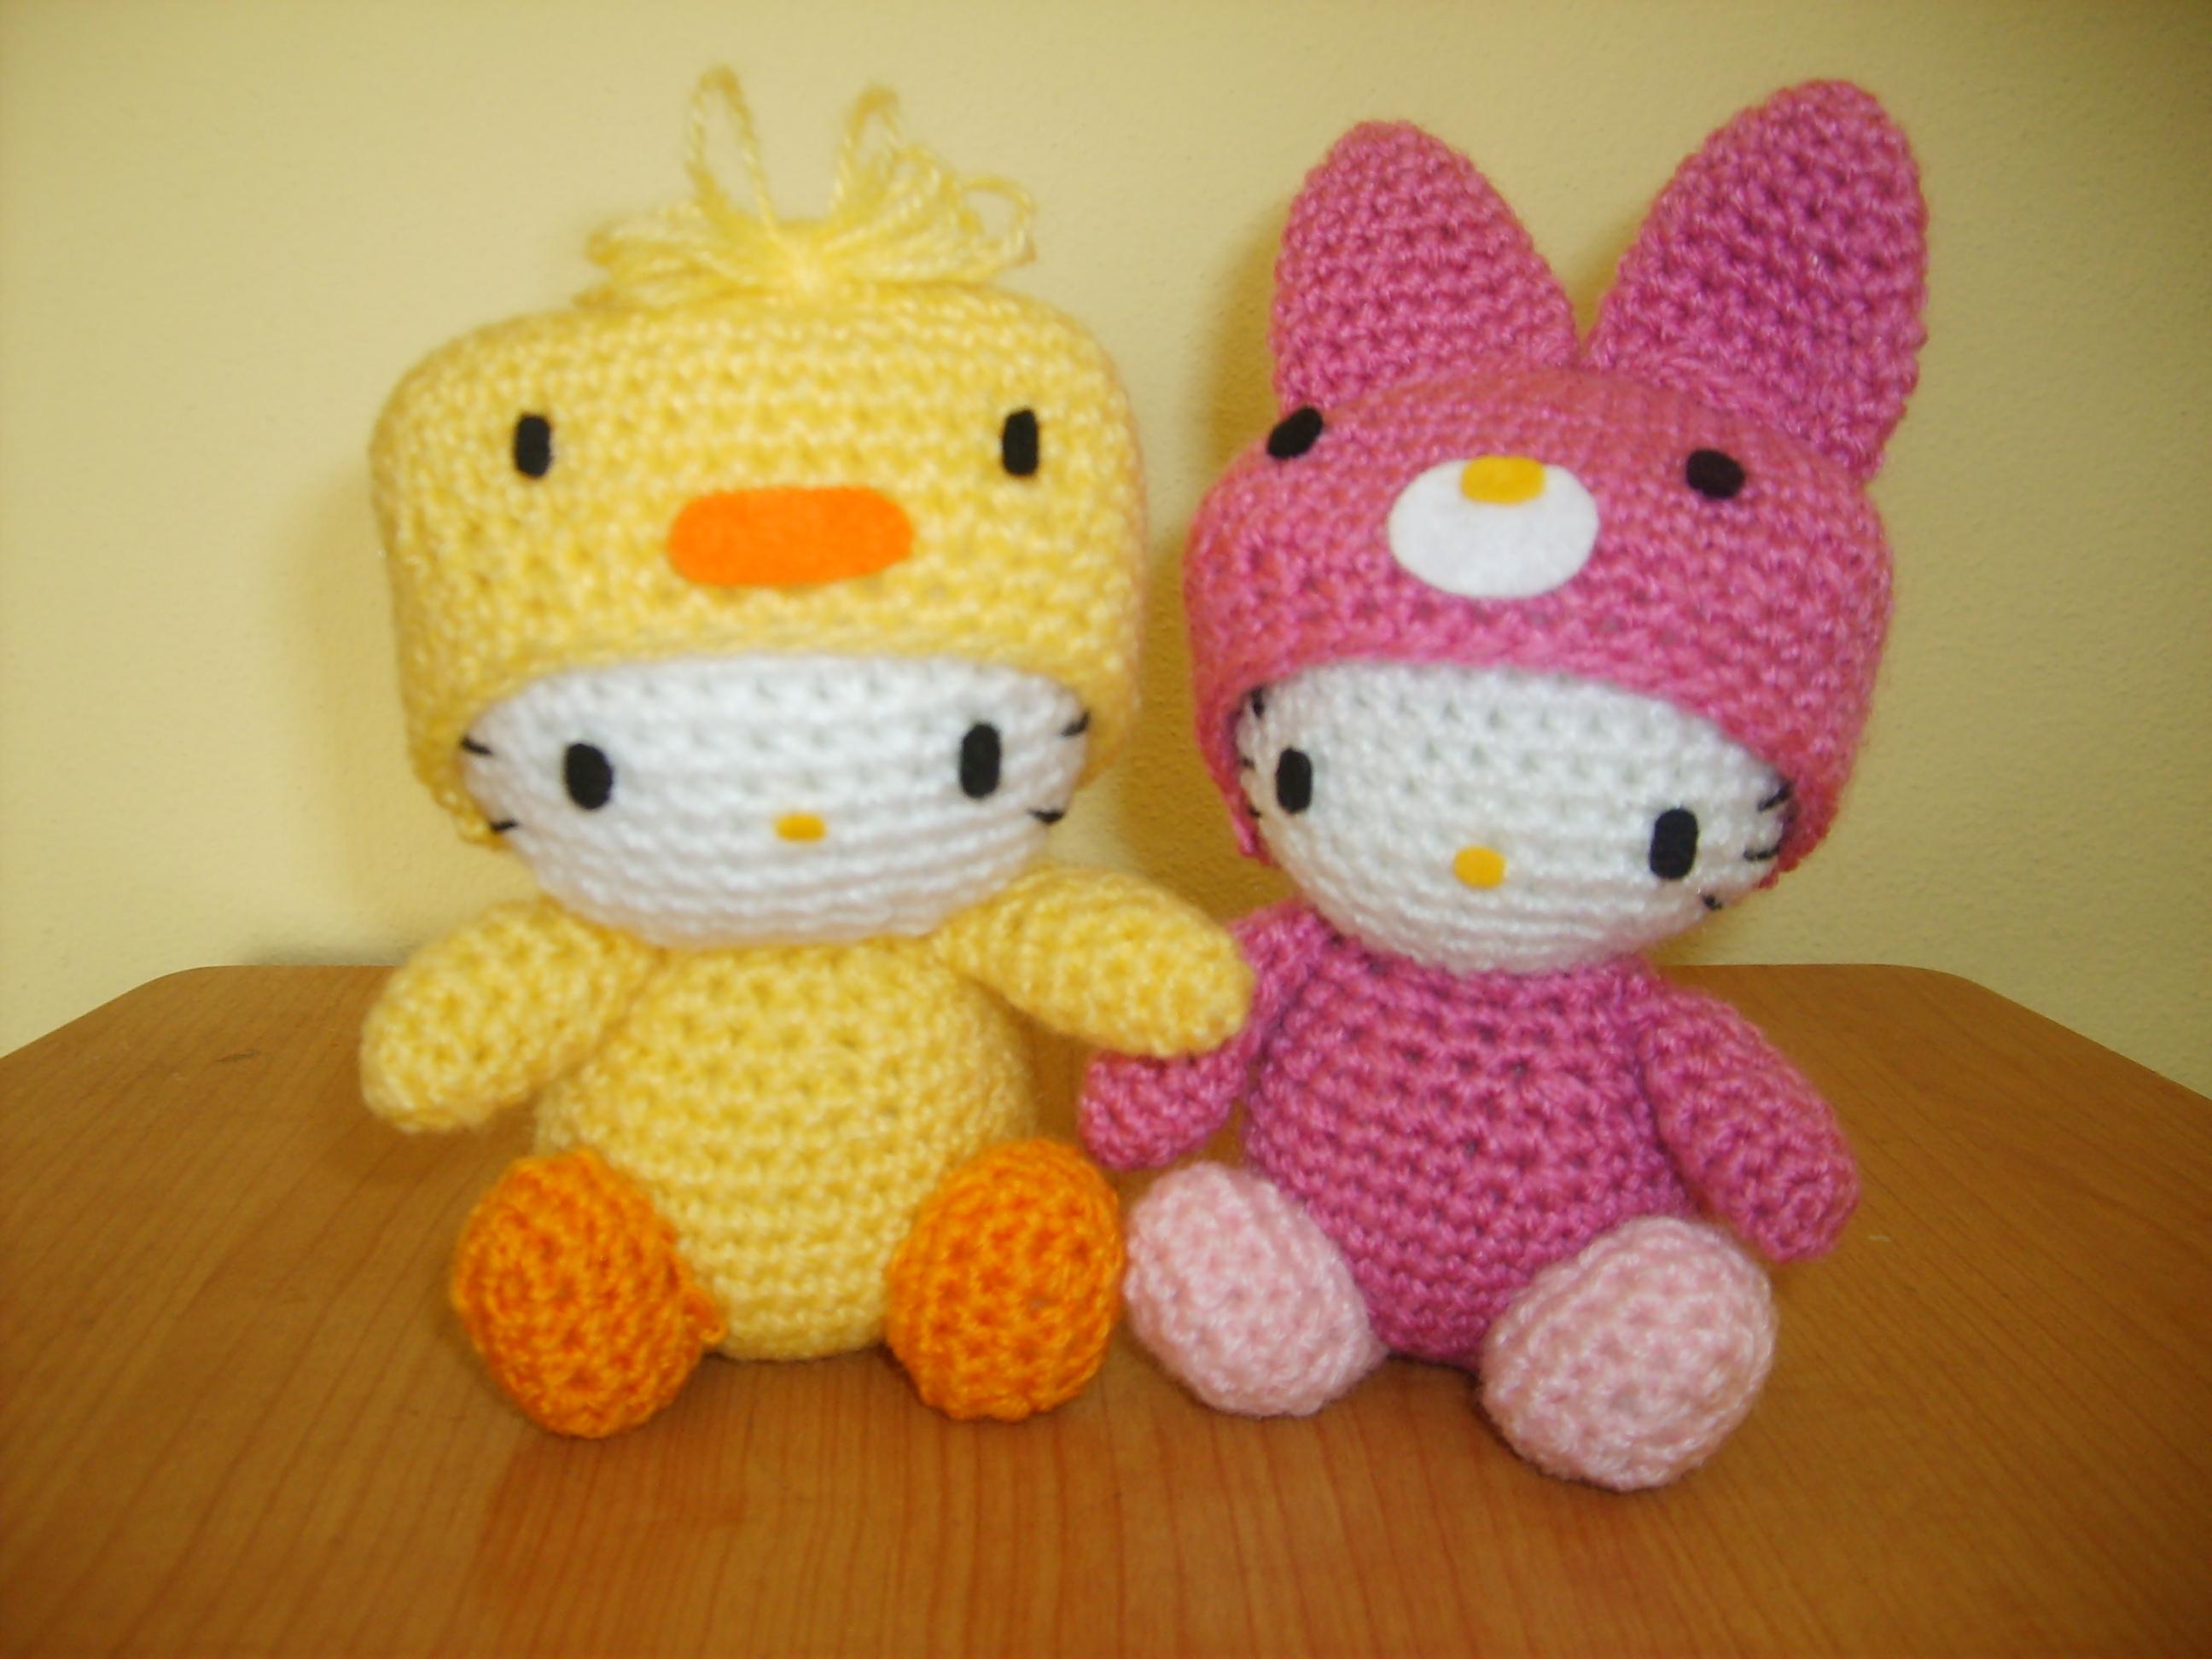 Free Crochet Pattern Heart Shaped Baby Doll : Hello Kitty amigurumi patron espanol - Imagui